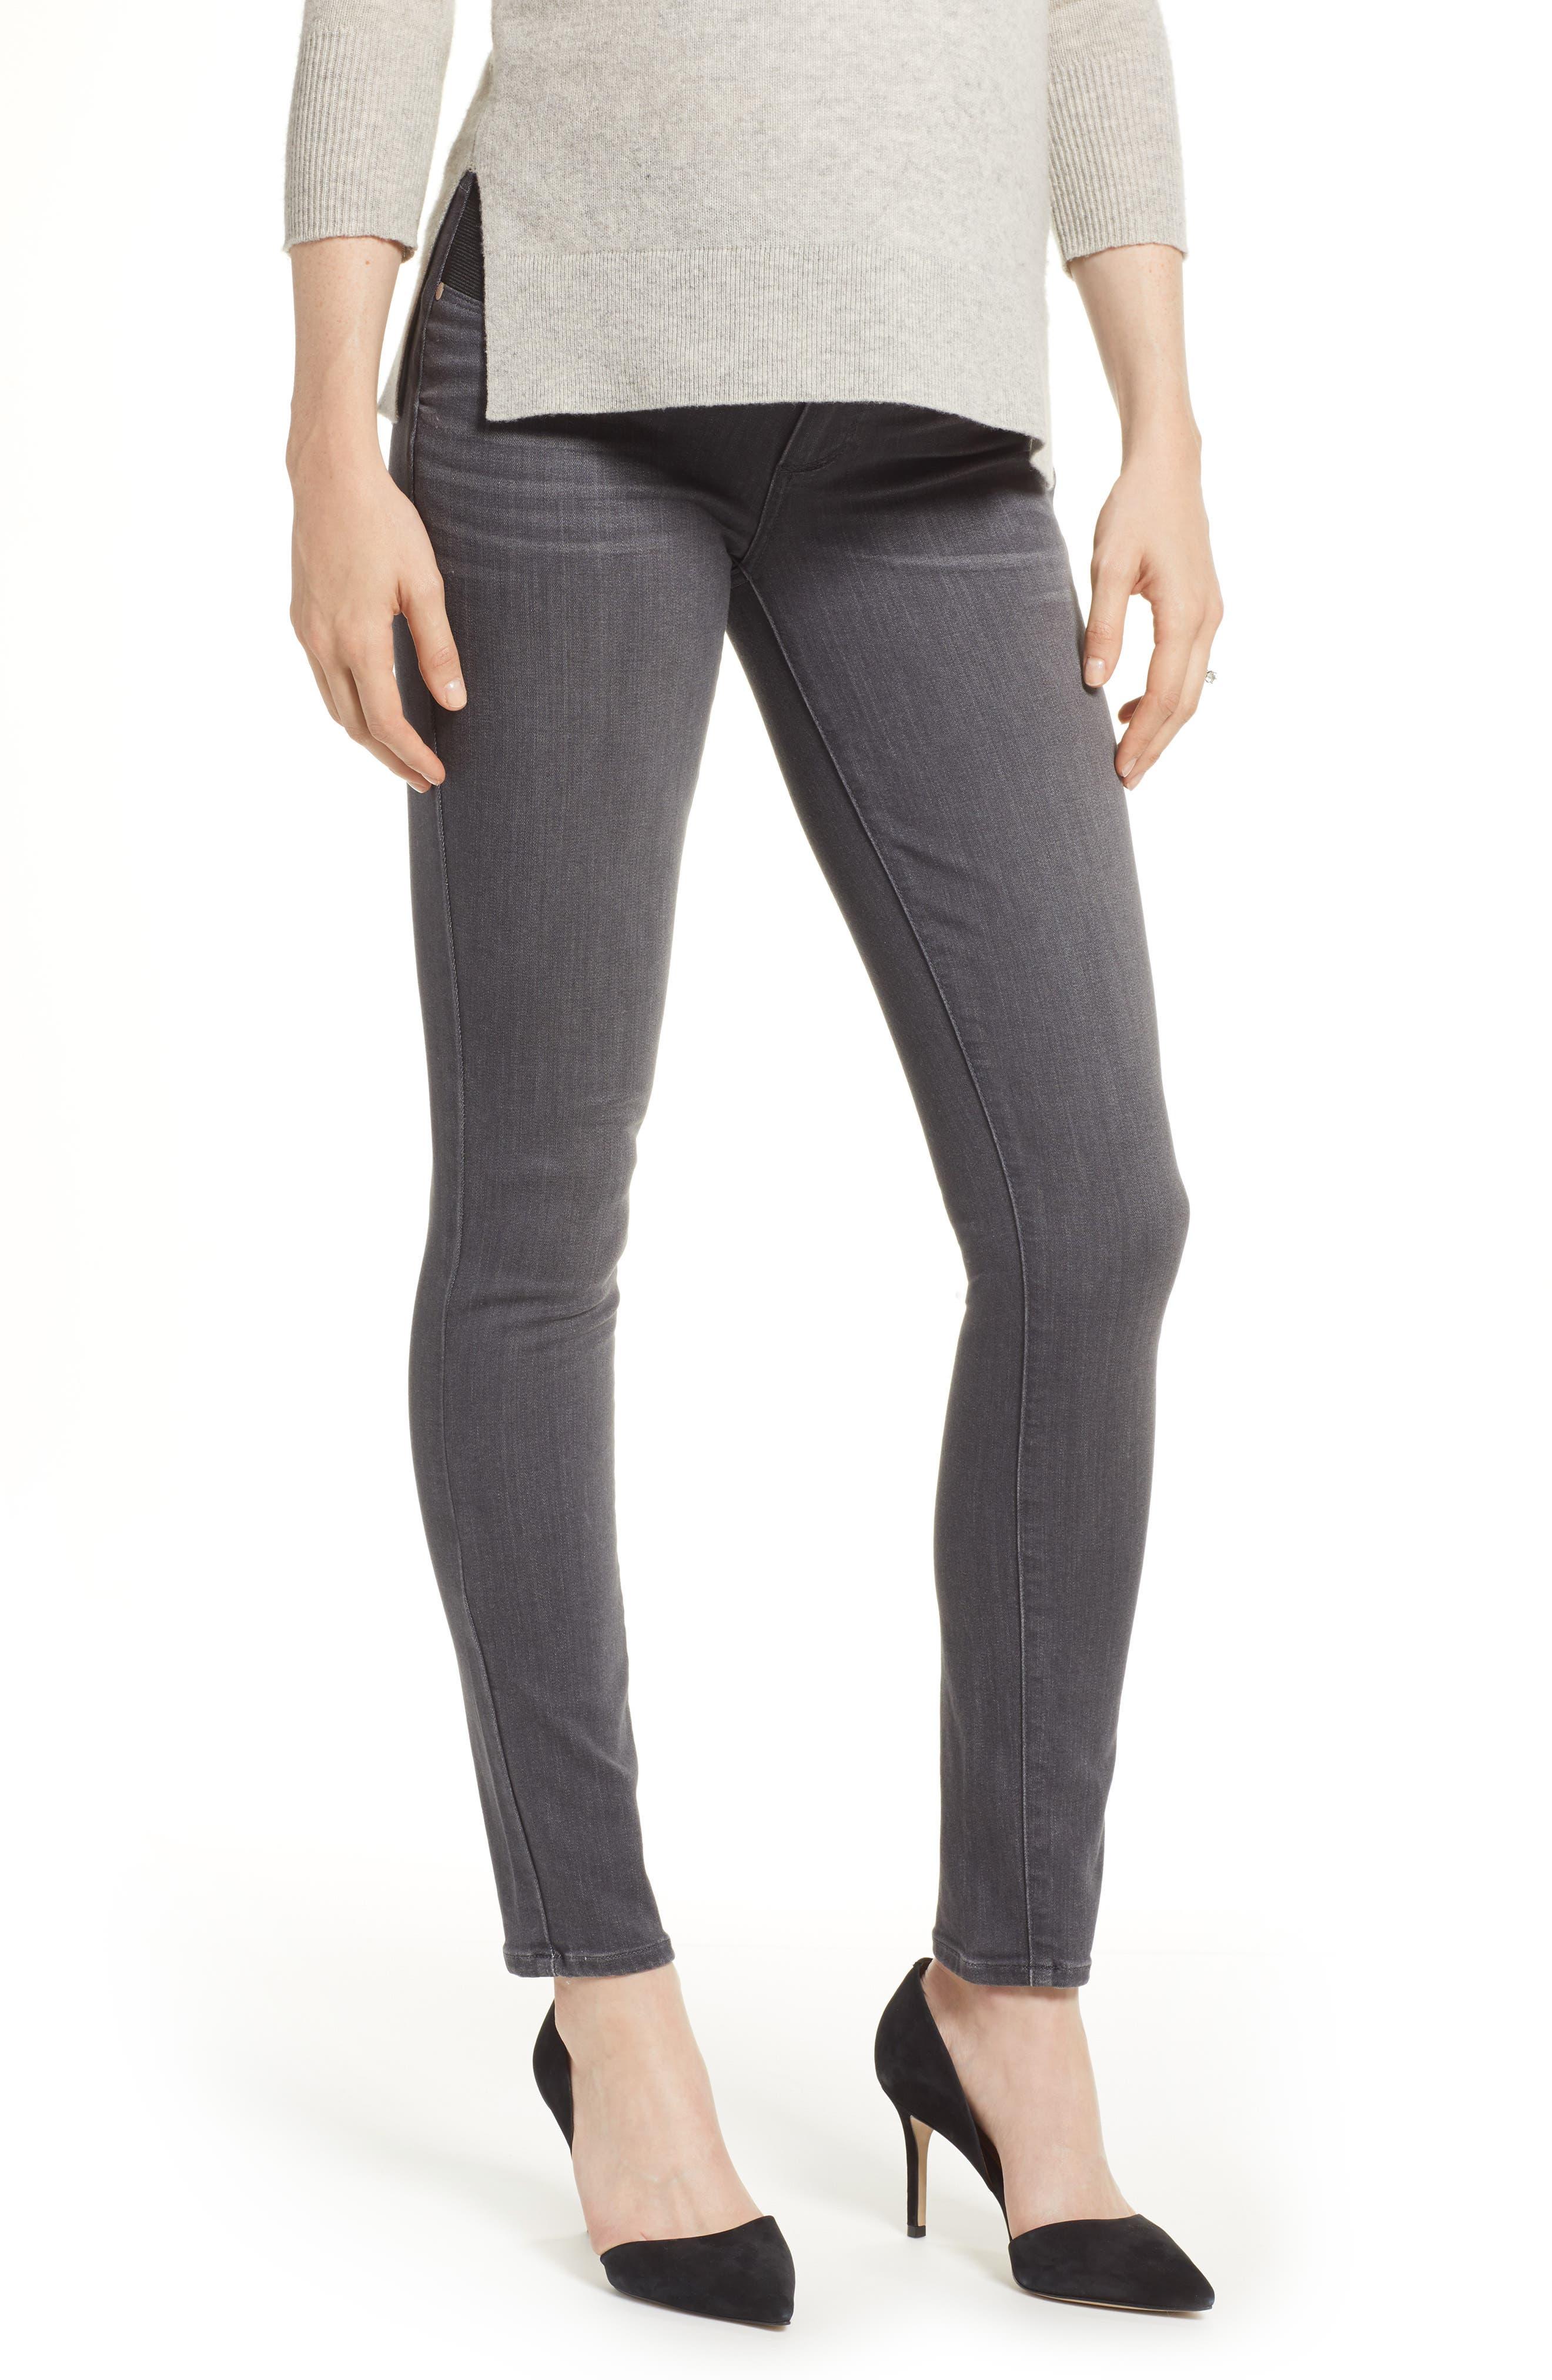 Transcend - Verdugo Maternity Skinny Jeans,                         Main,                         color, GREY PEAKS